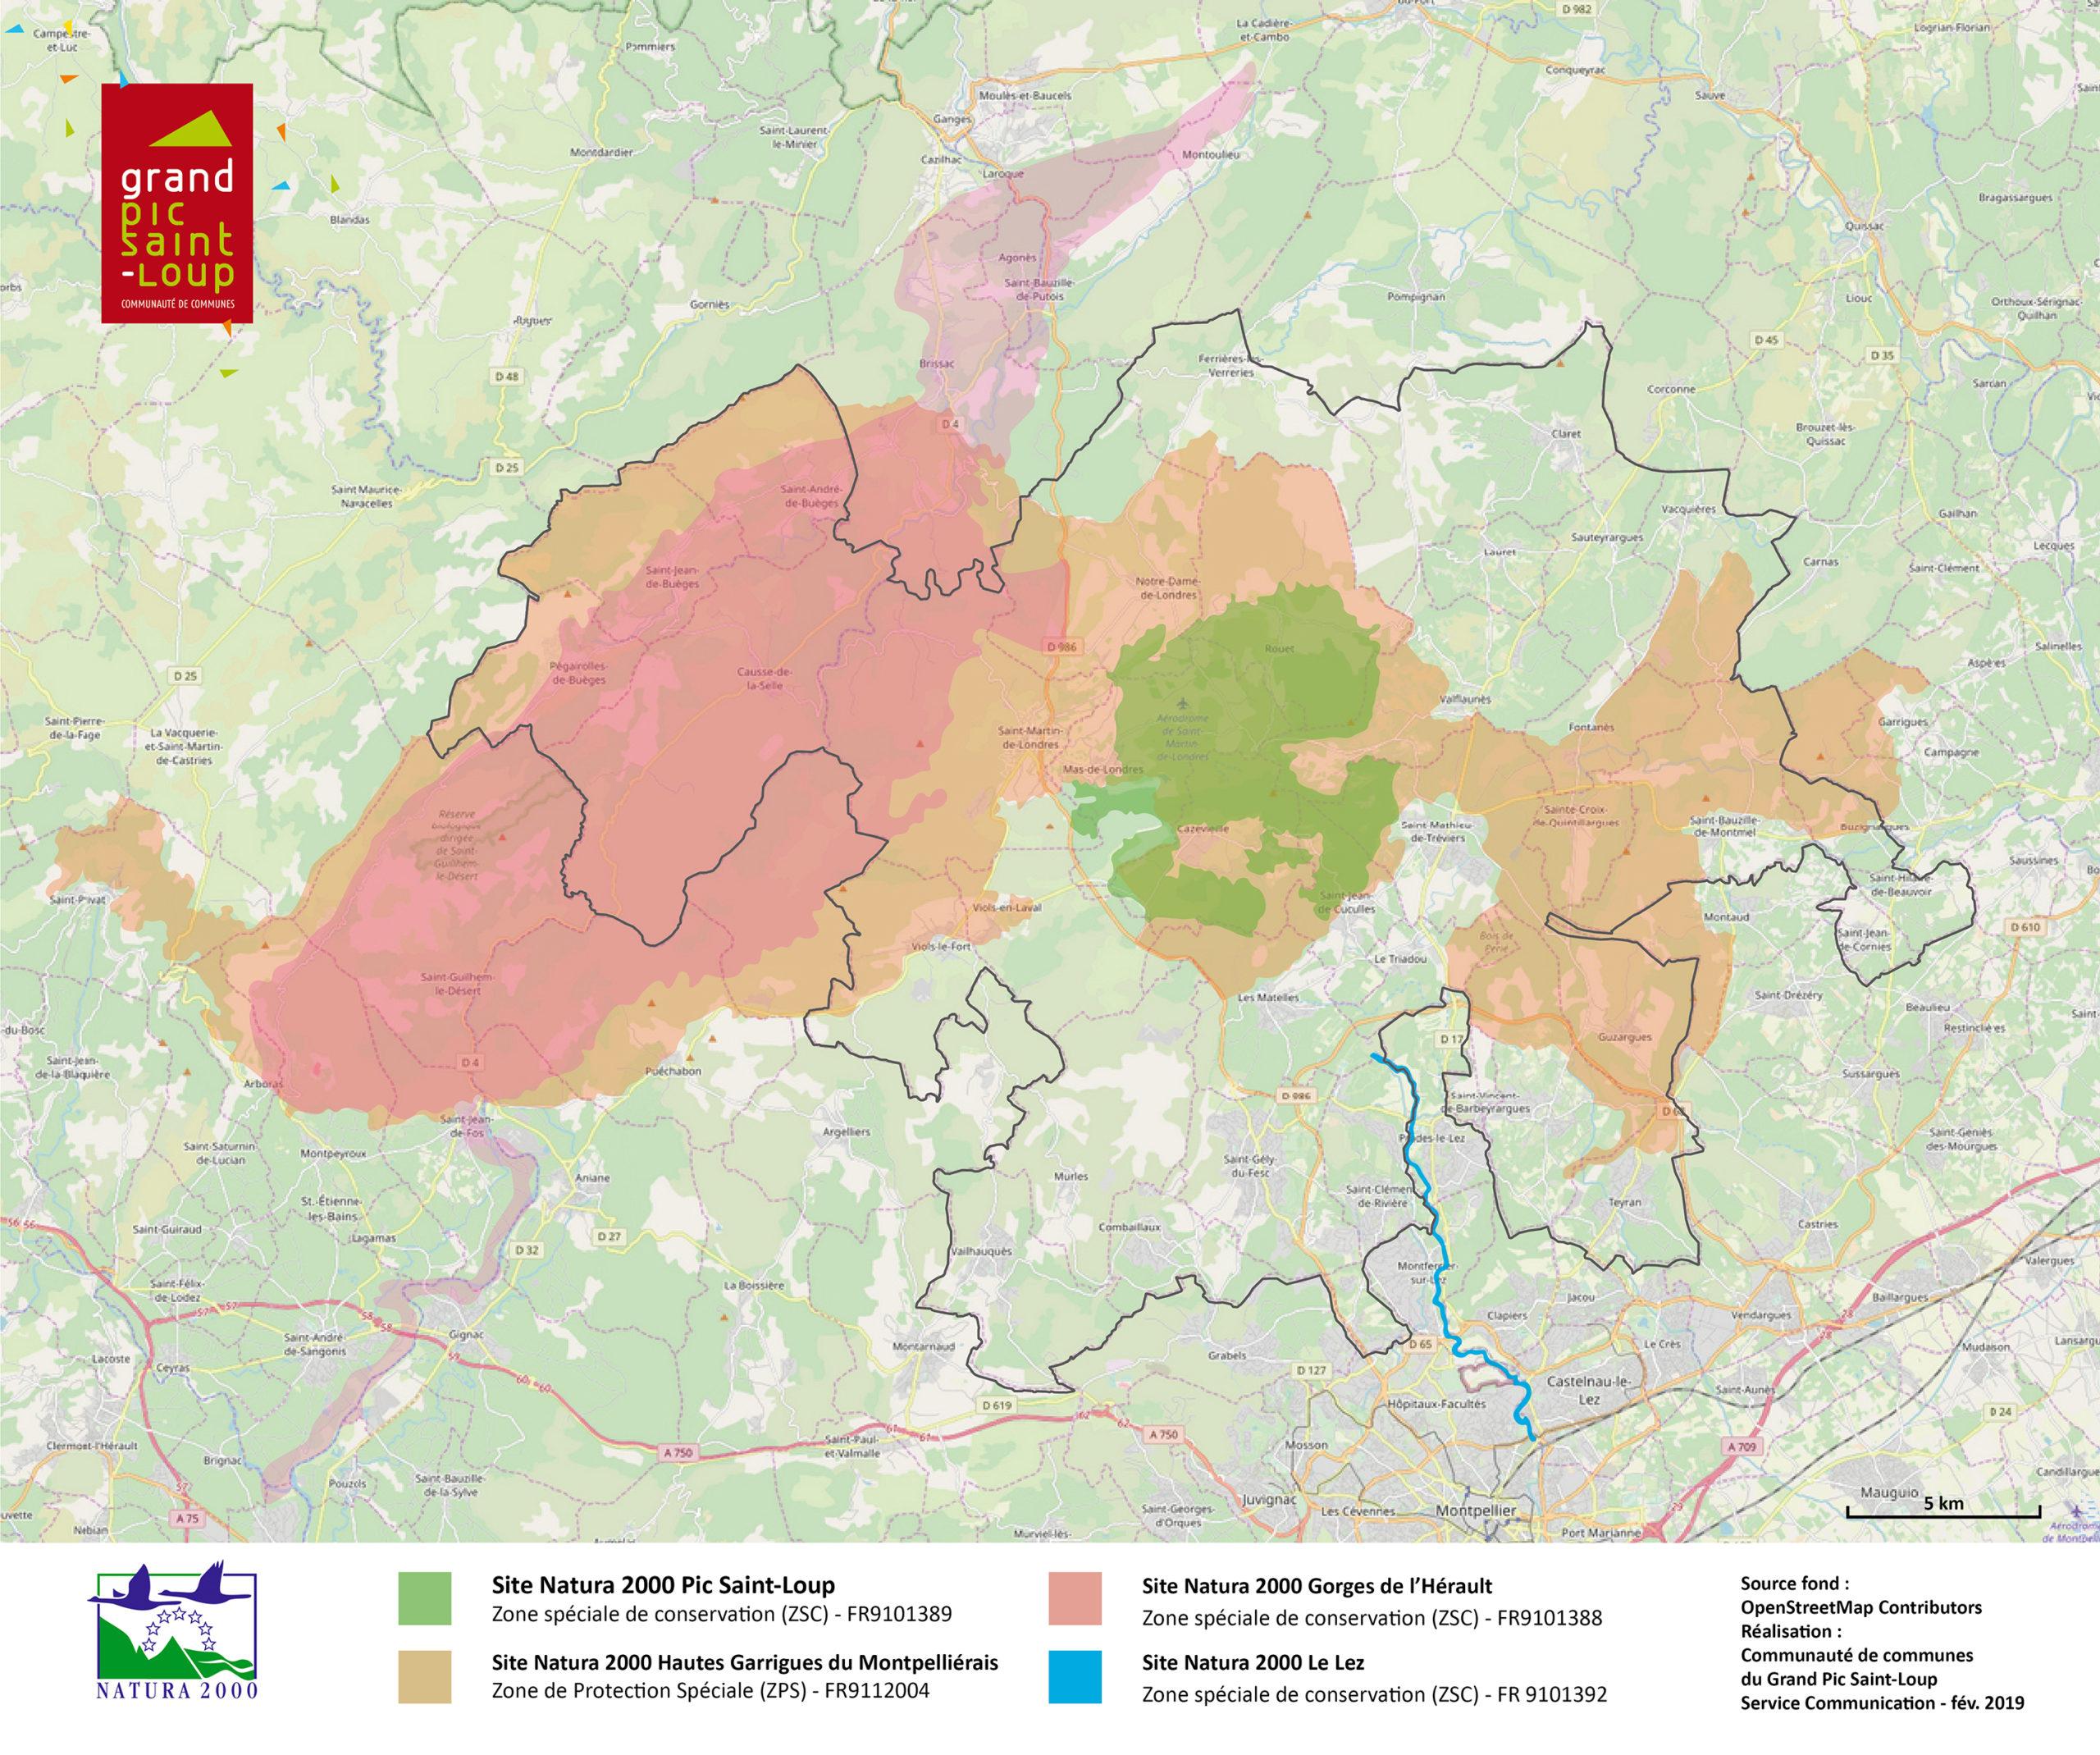 Les 4 sites Natura 2000 du Grand Pic Saint-Loup